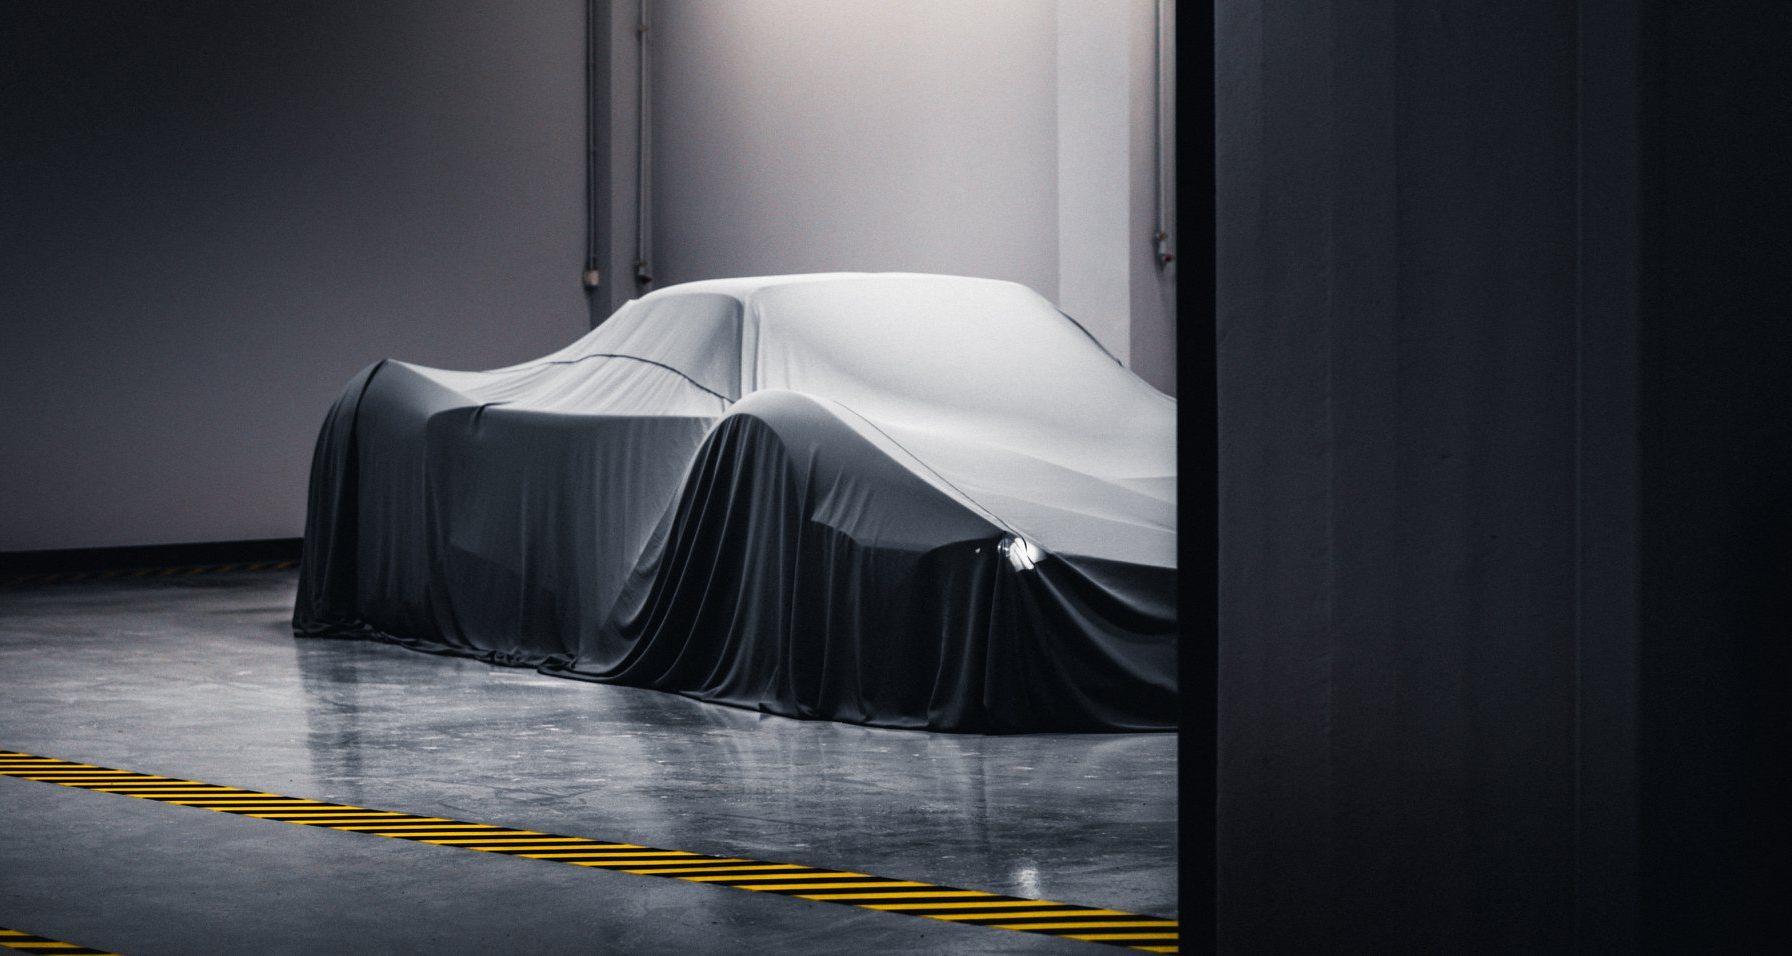 Spyros-Panopoulos-Automotive-Chaos-e1583155036879